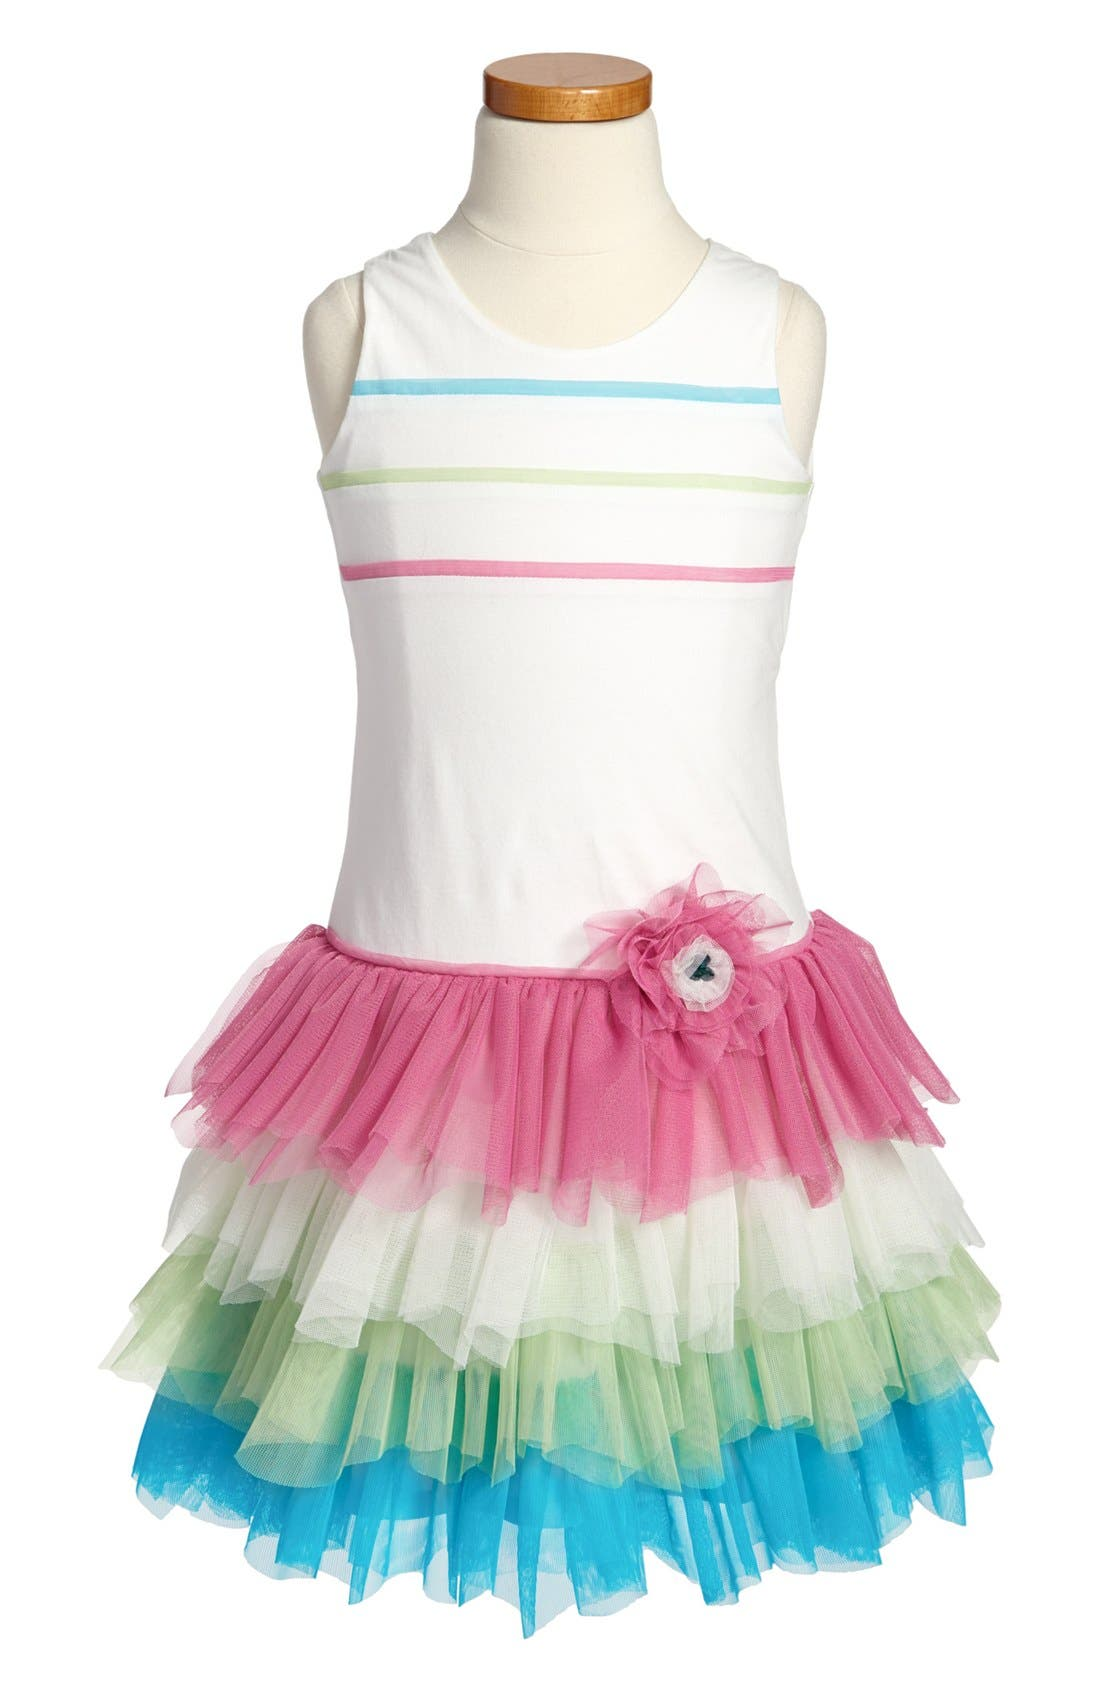 Main Image - Isobella & Chloe 'Tutti Frutti' Sleeveless Dress (Little Girls & Big Girls)